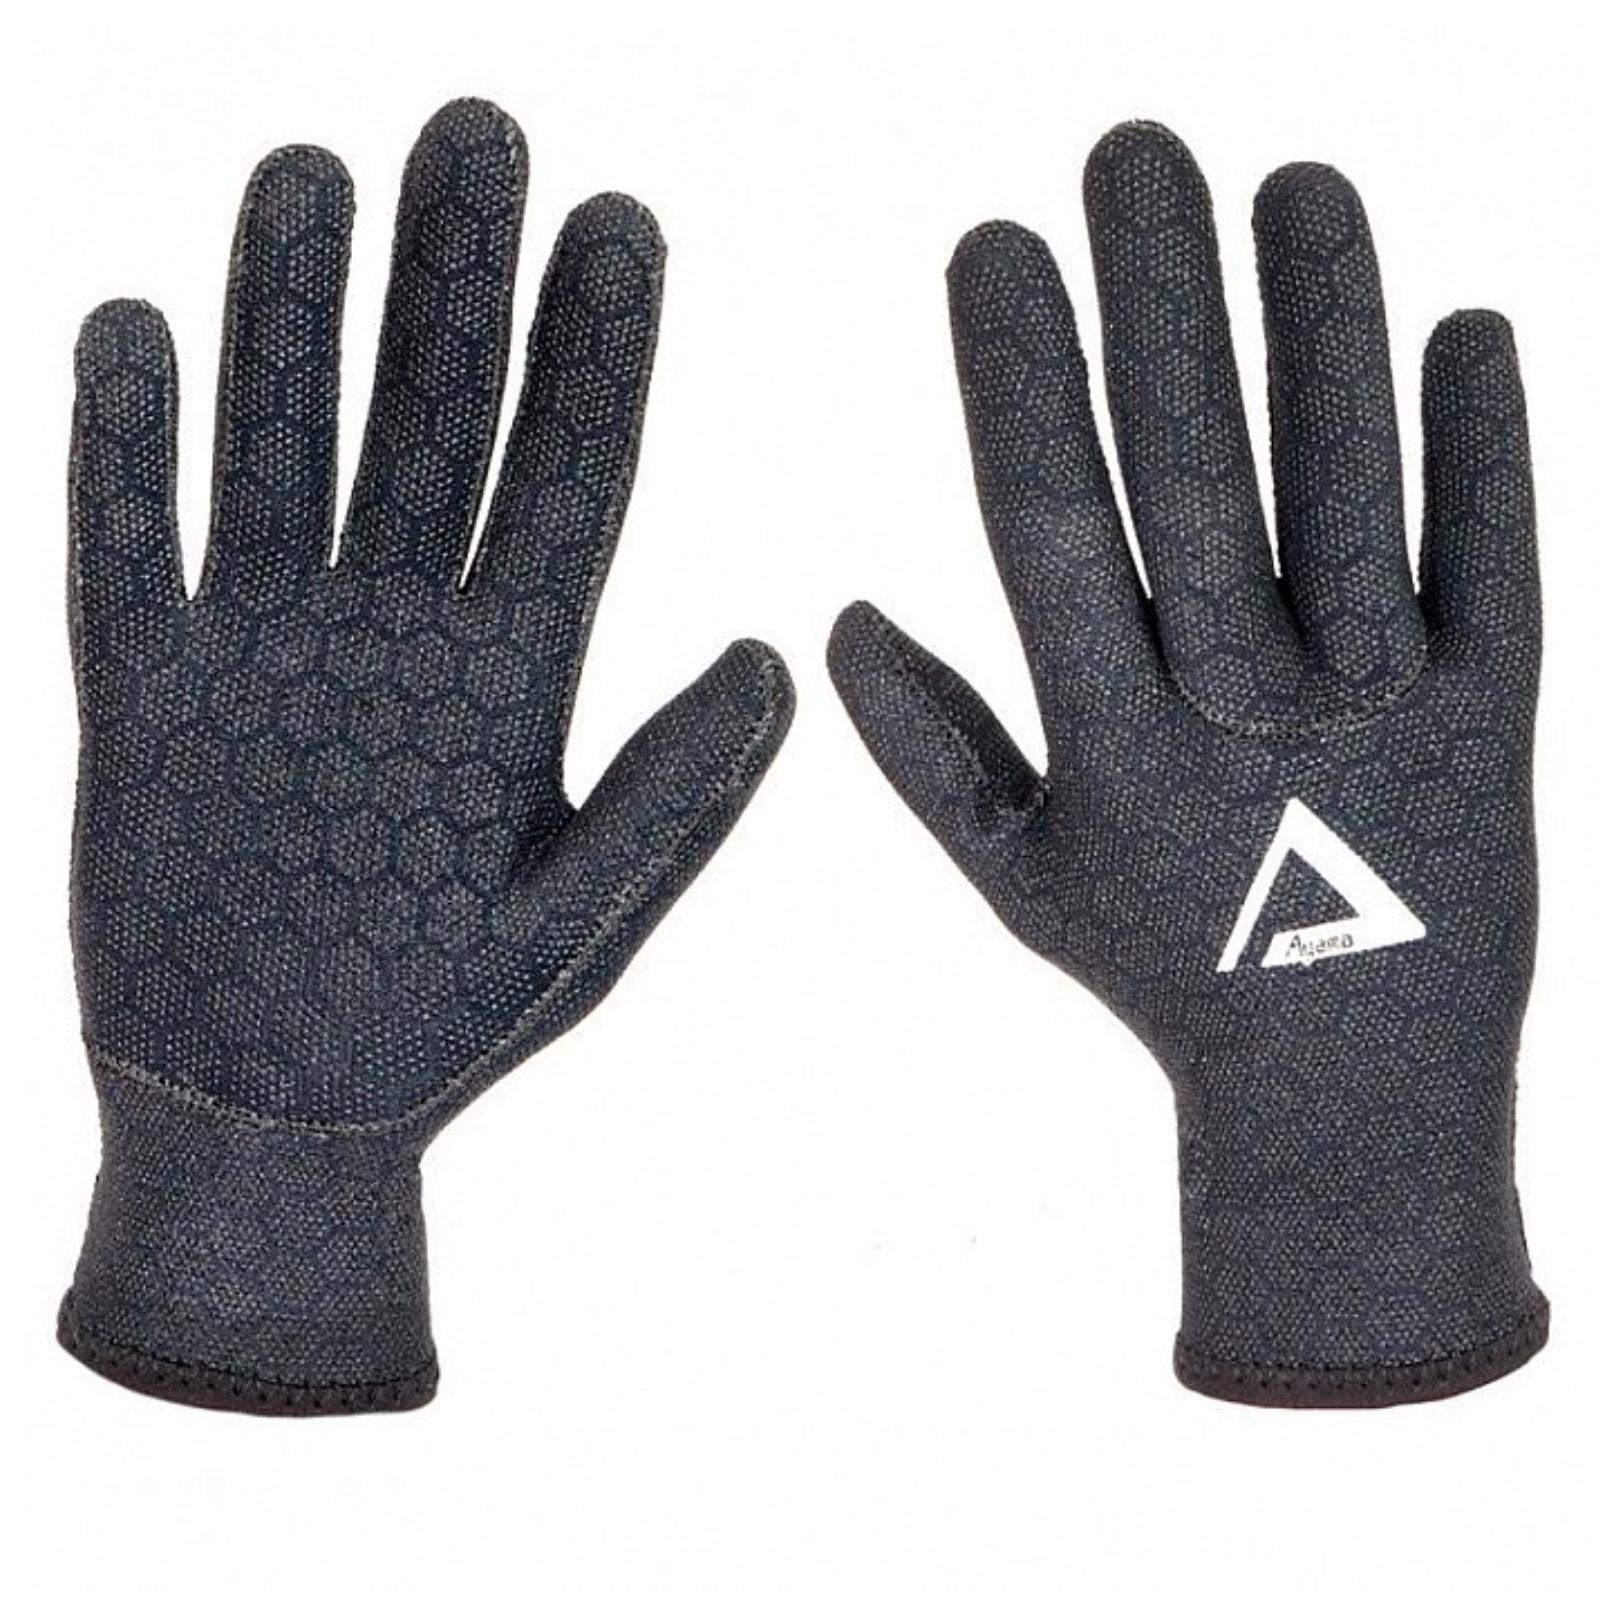 Neoprenové rukavice AGAMA Superstretch 1,5 mm - vel. L